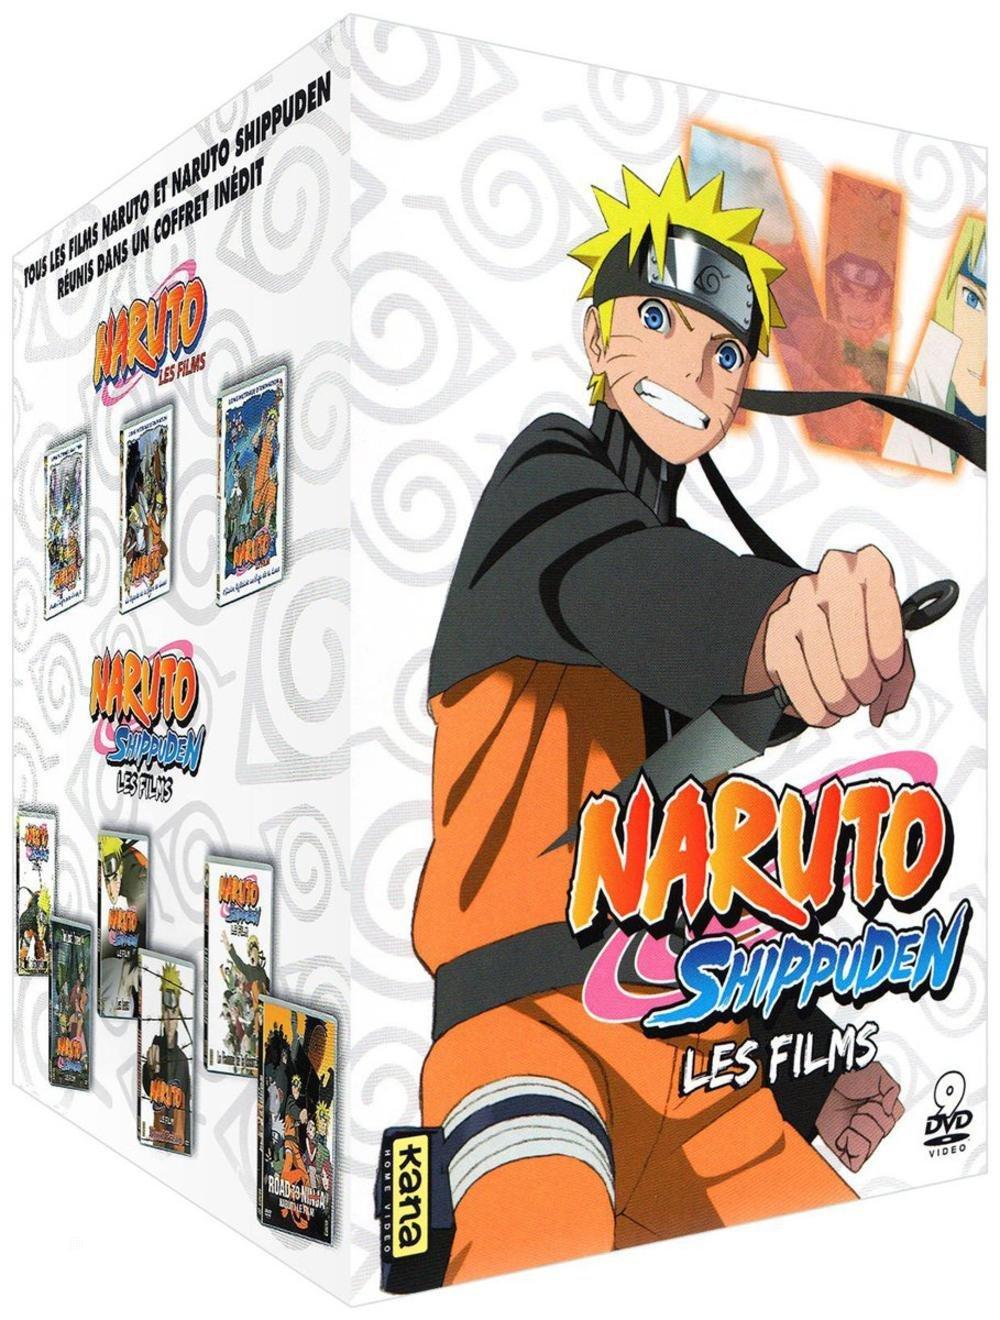 Naruto & Naruto Shippuden - Les 9 films